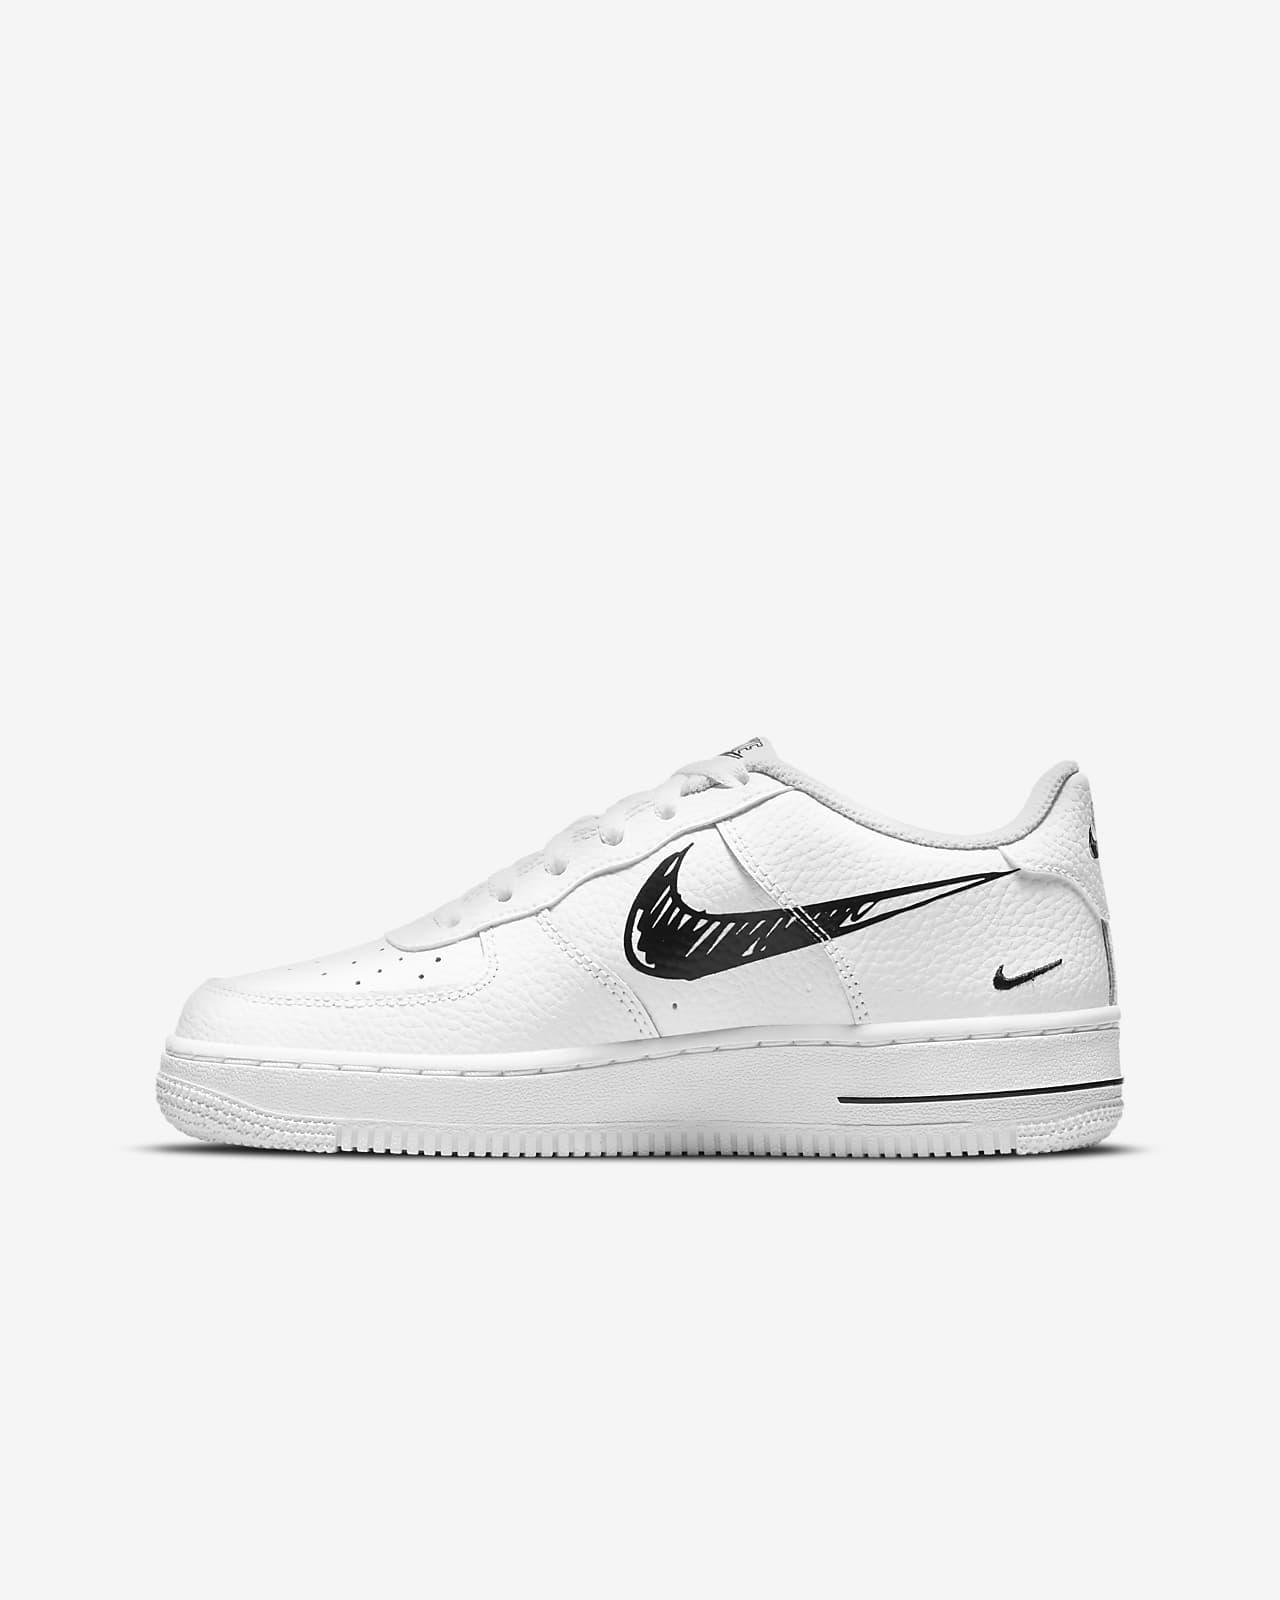 Nike Air Force 1 Low Big Kids' Shoe